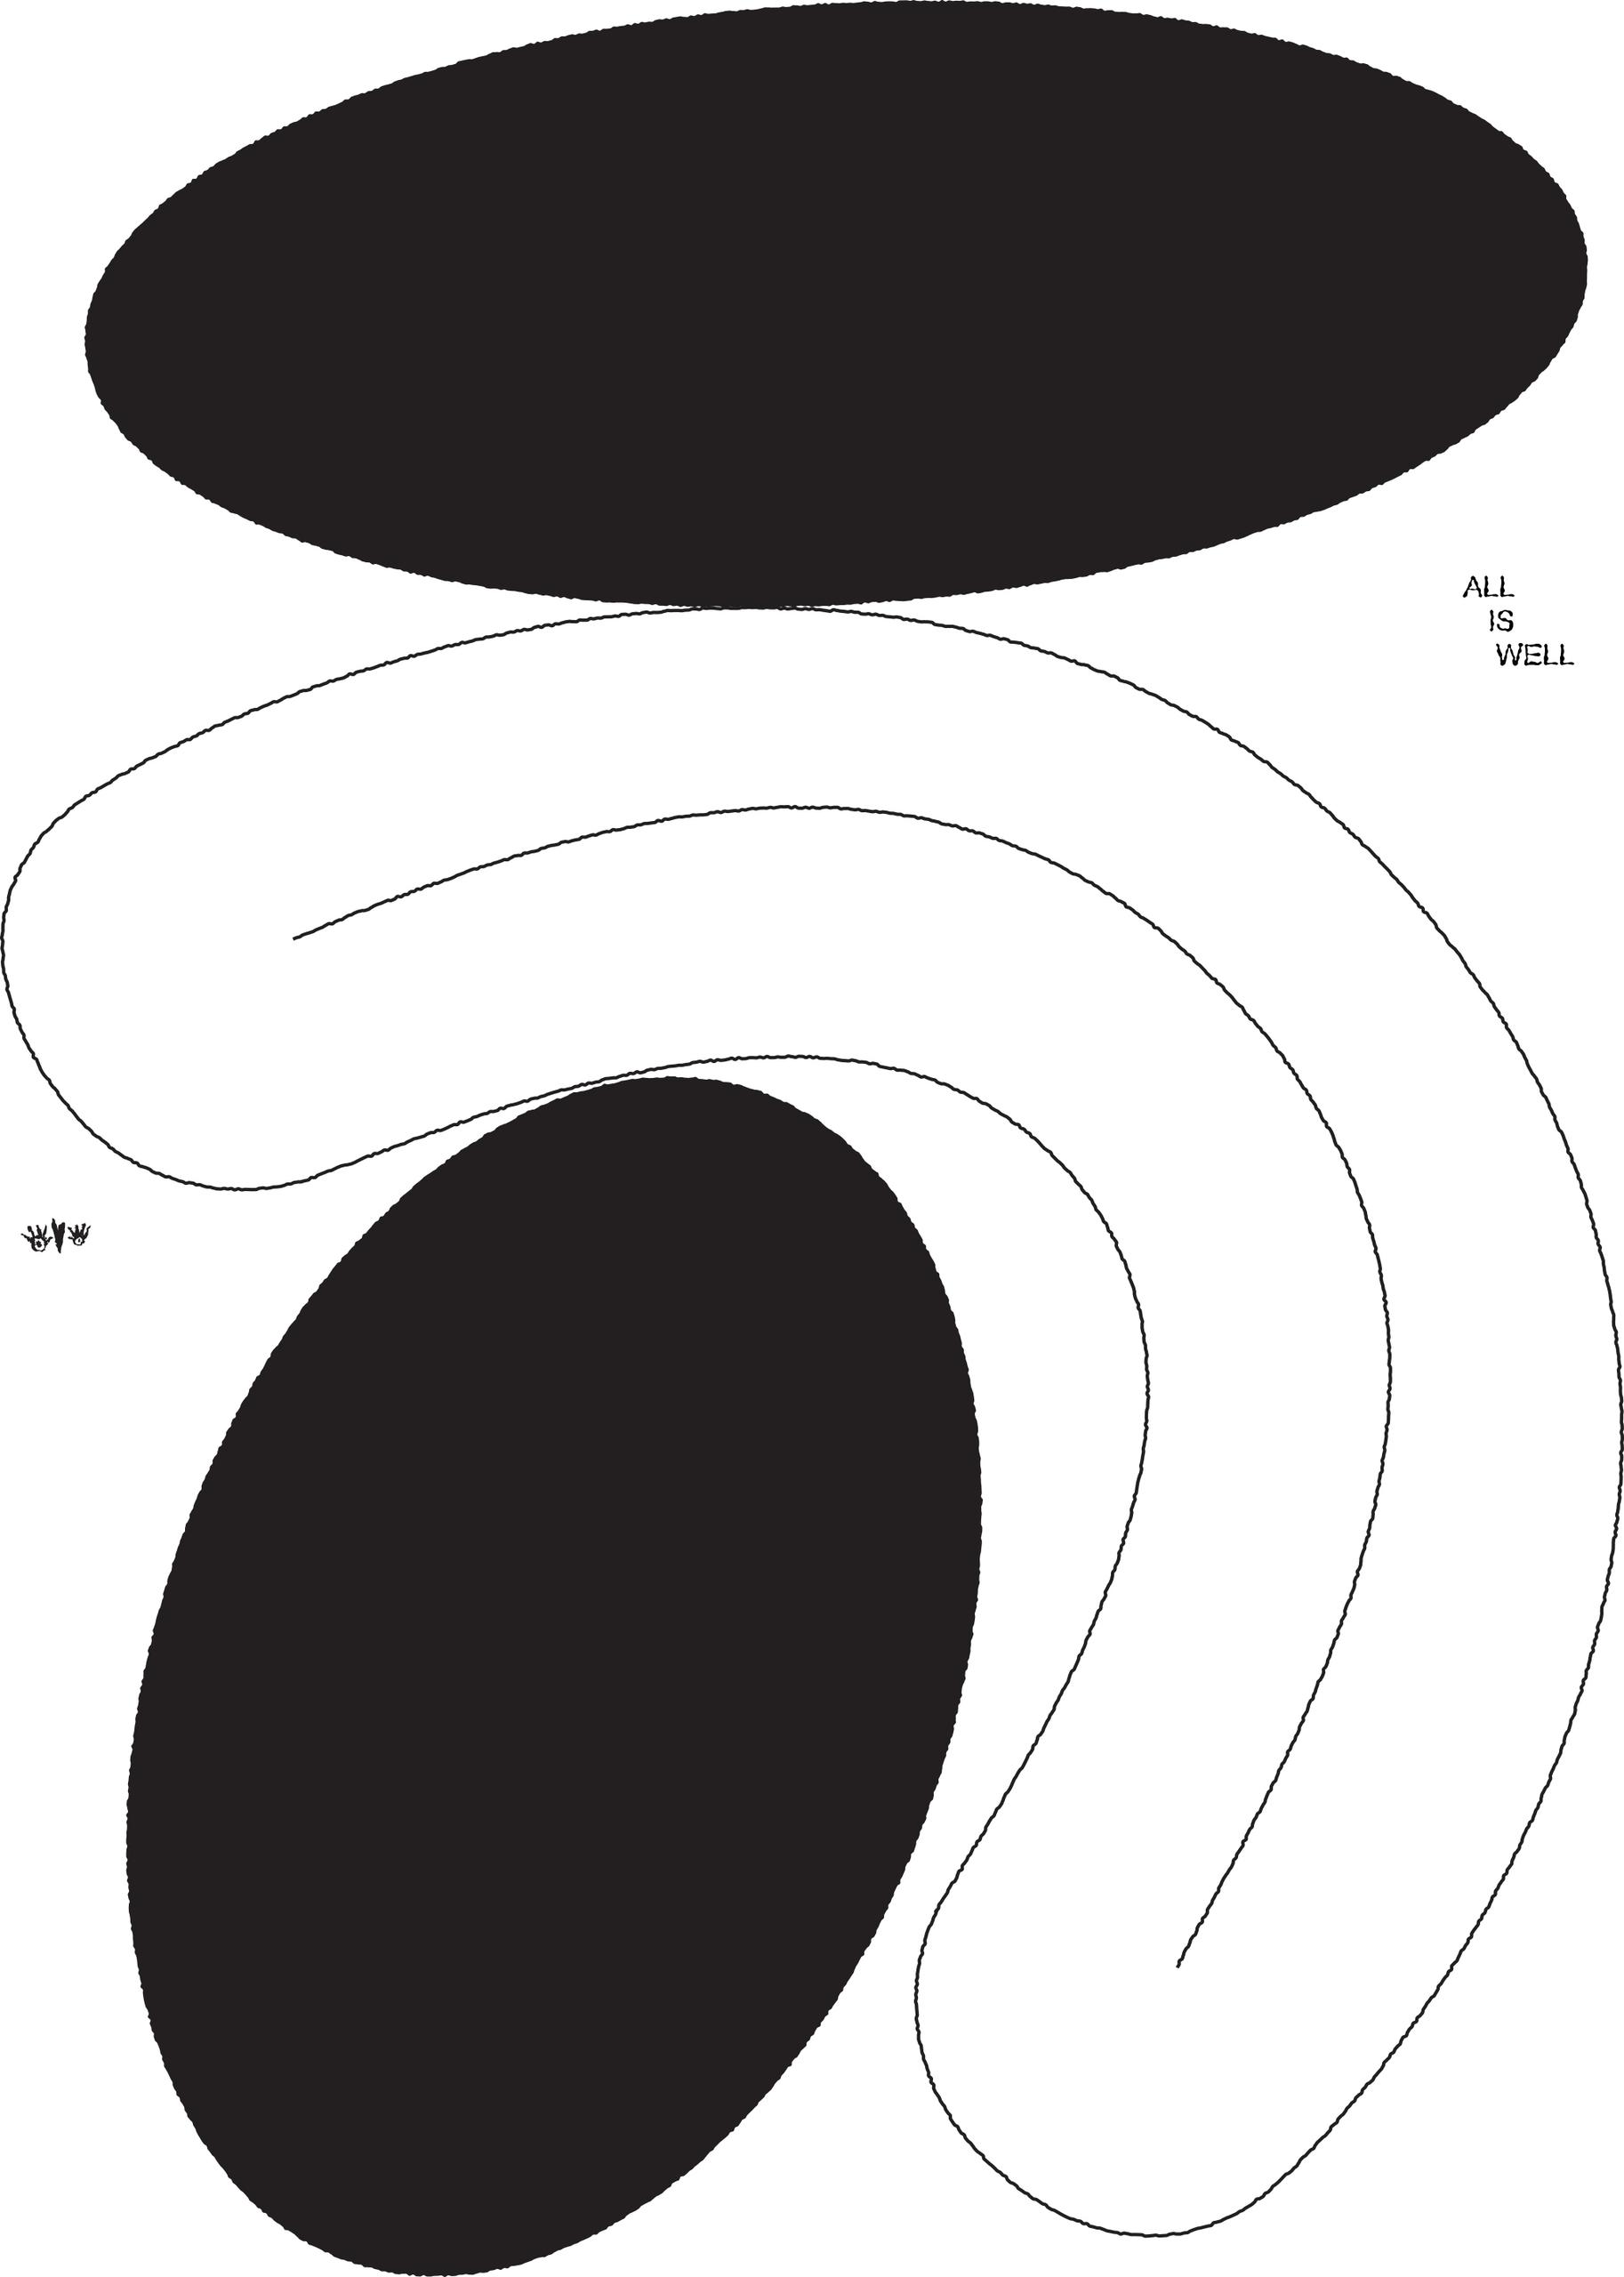 Facial tick - illustration, graphicdesign - mattluckhurst | ello